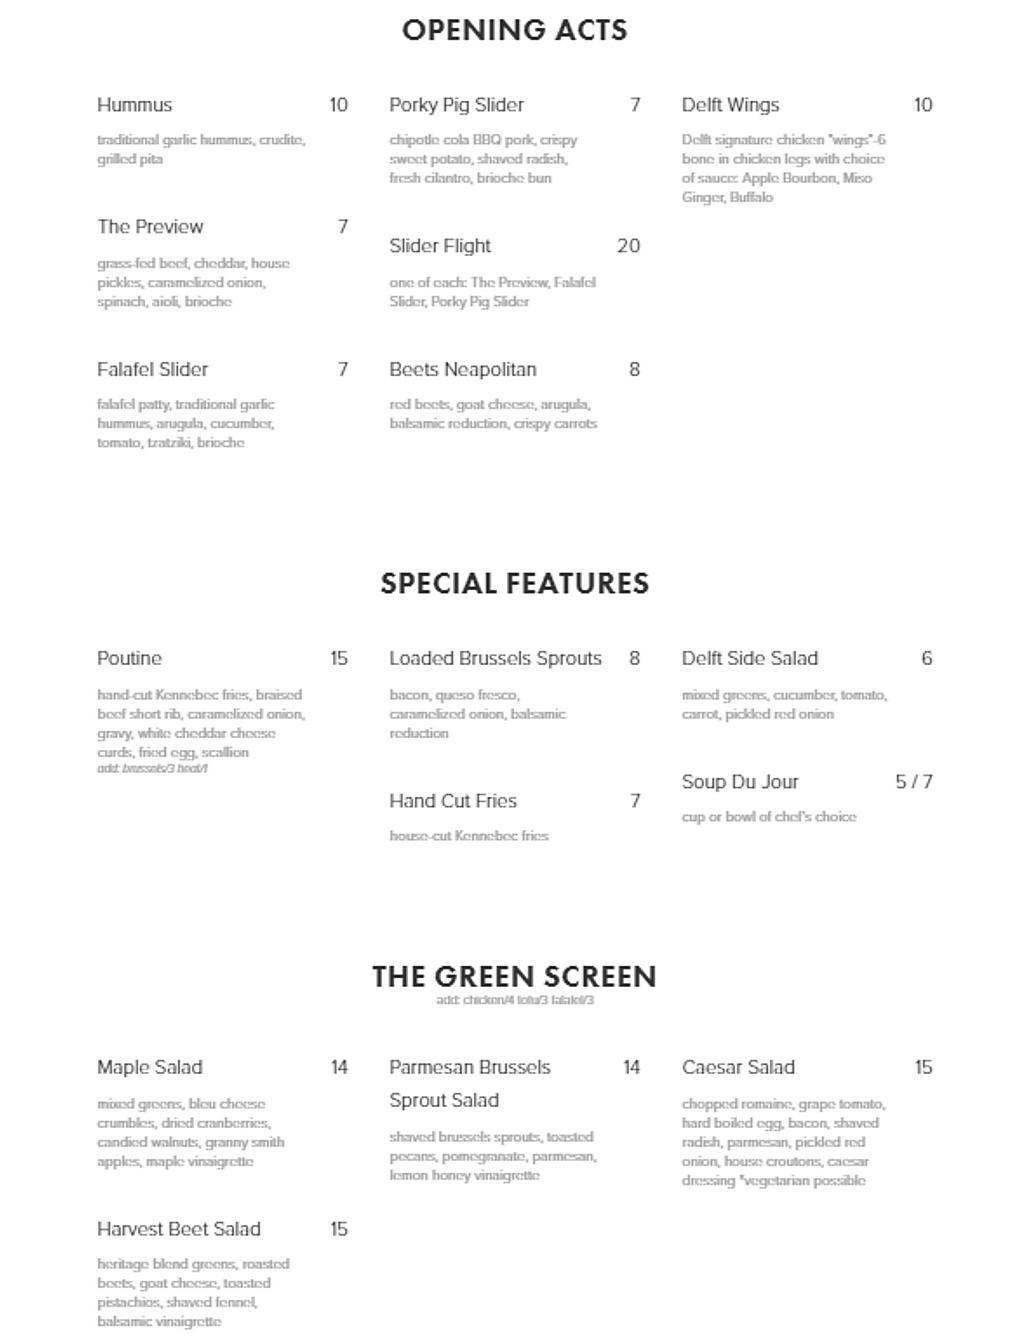 Delft Bistro restaurant menu wine list hours location deals Marquette Now